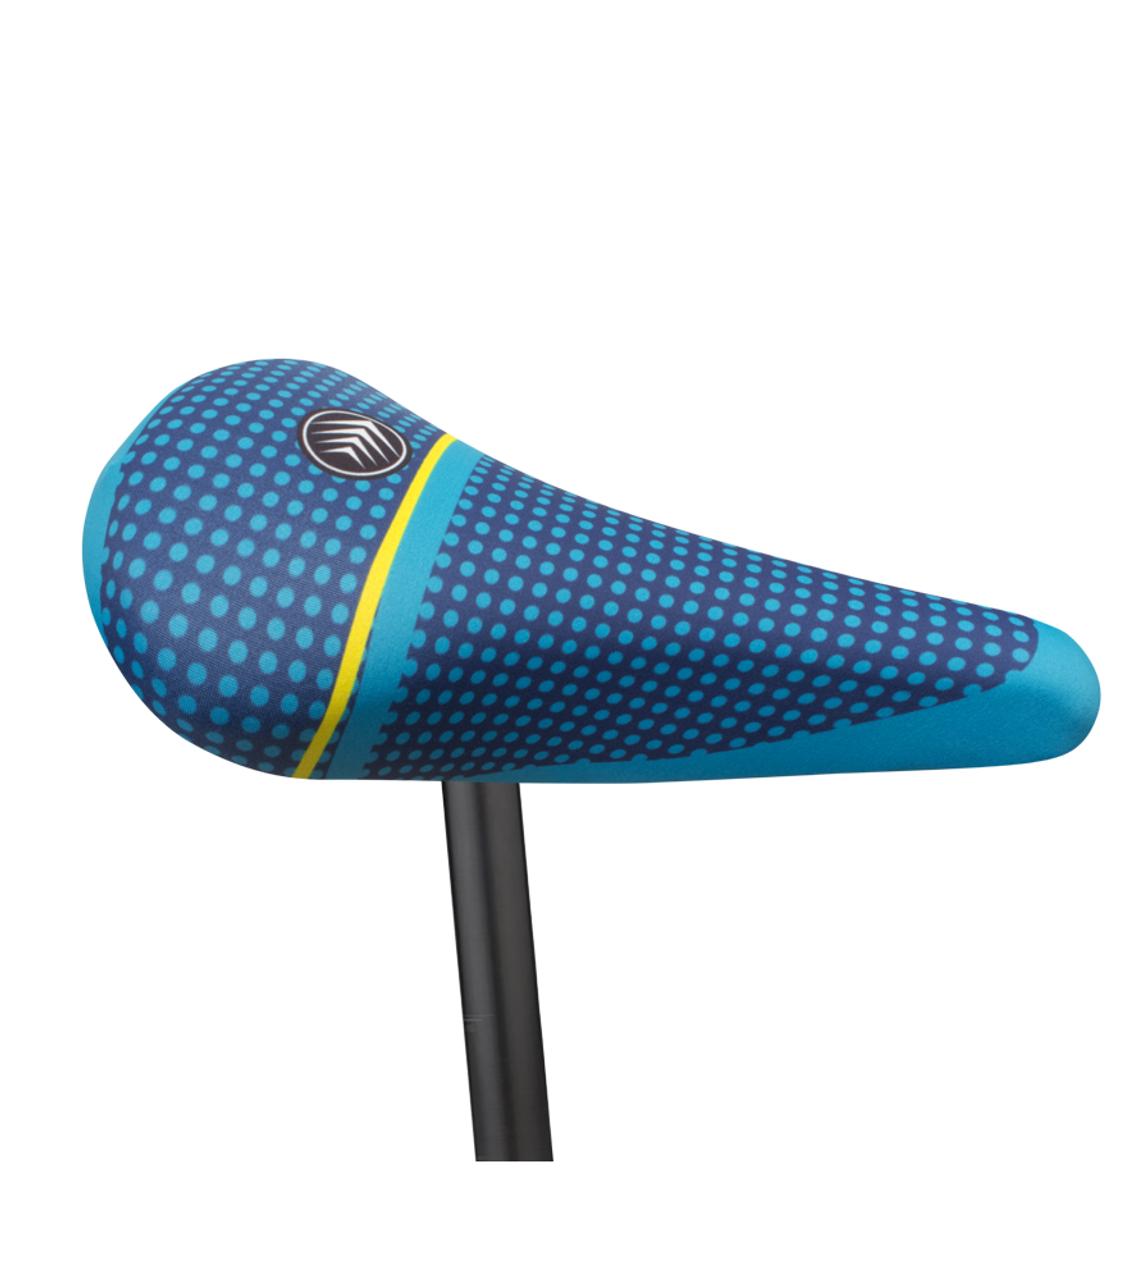 Aqua Blue NEW! Lycra Bicycle Seat Cover